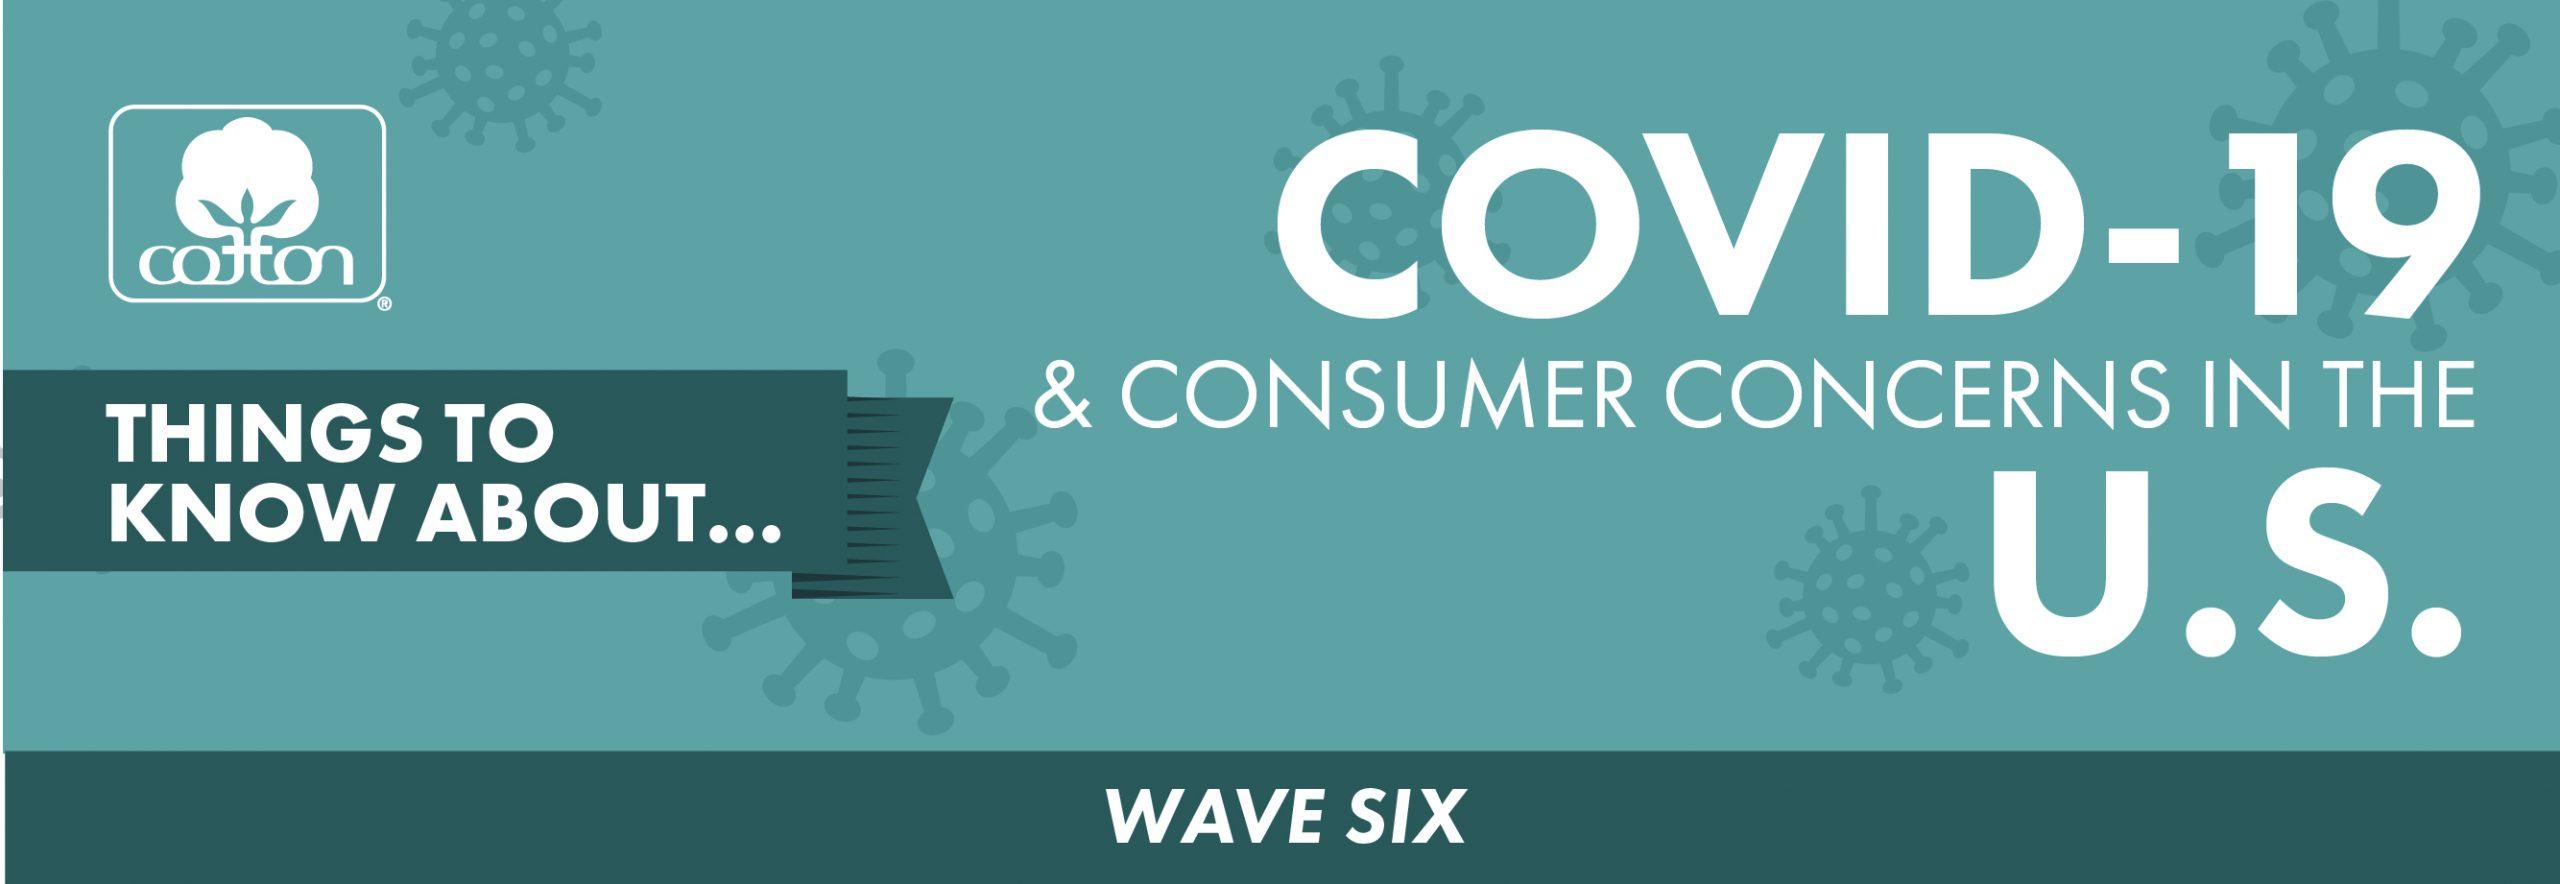 COVID-19 & Consumer Concerns in the U.S.